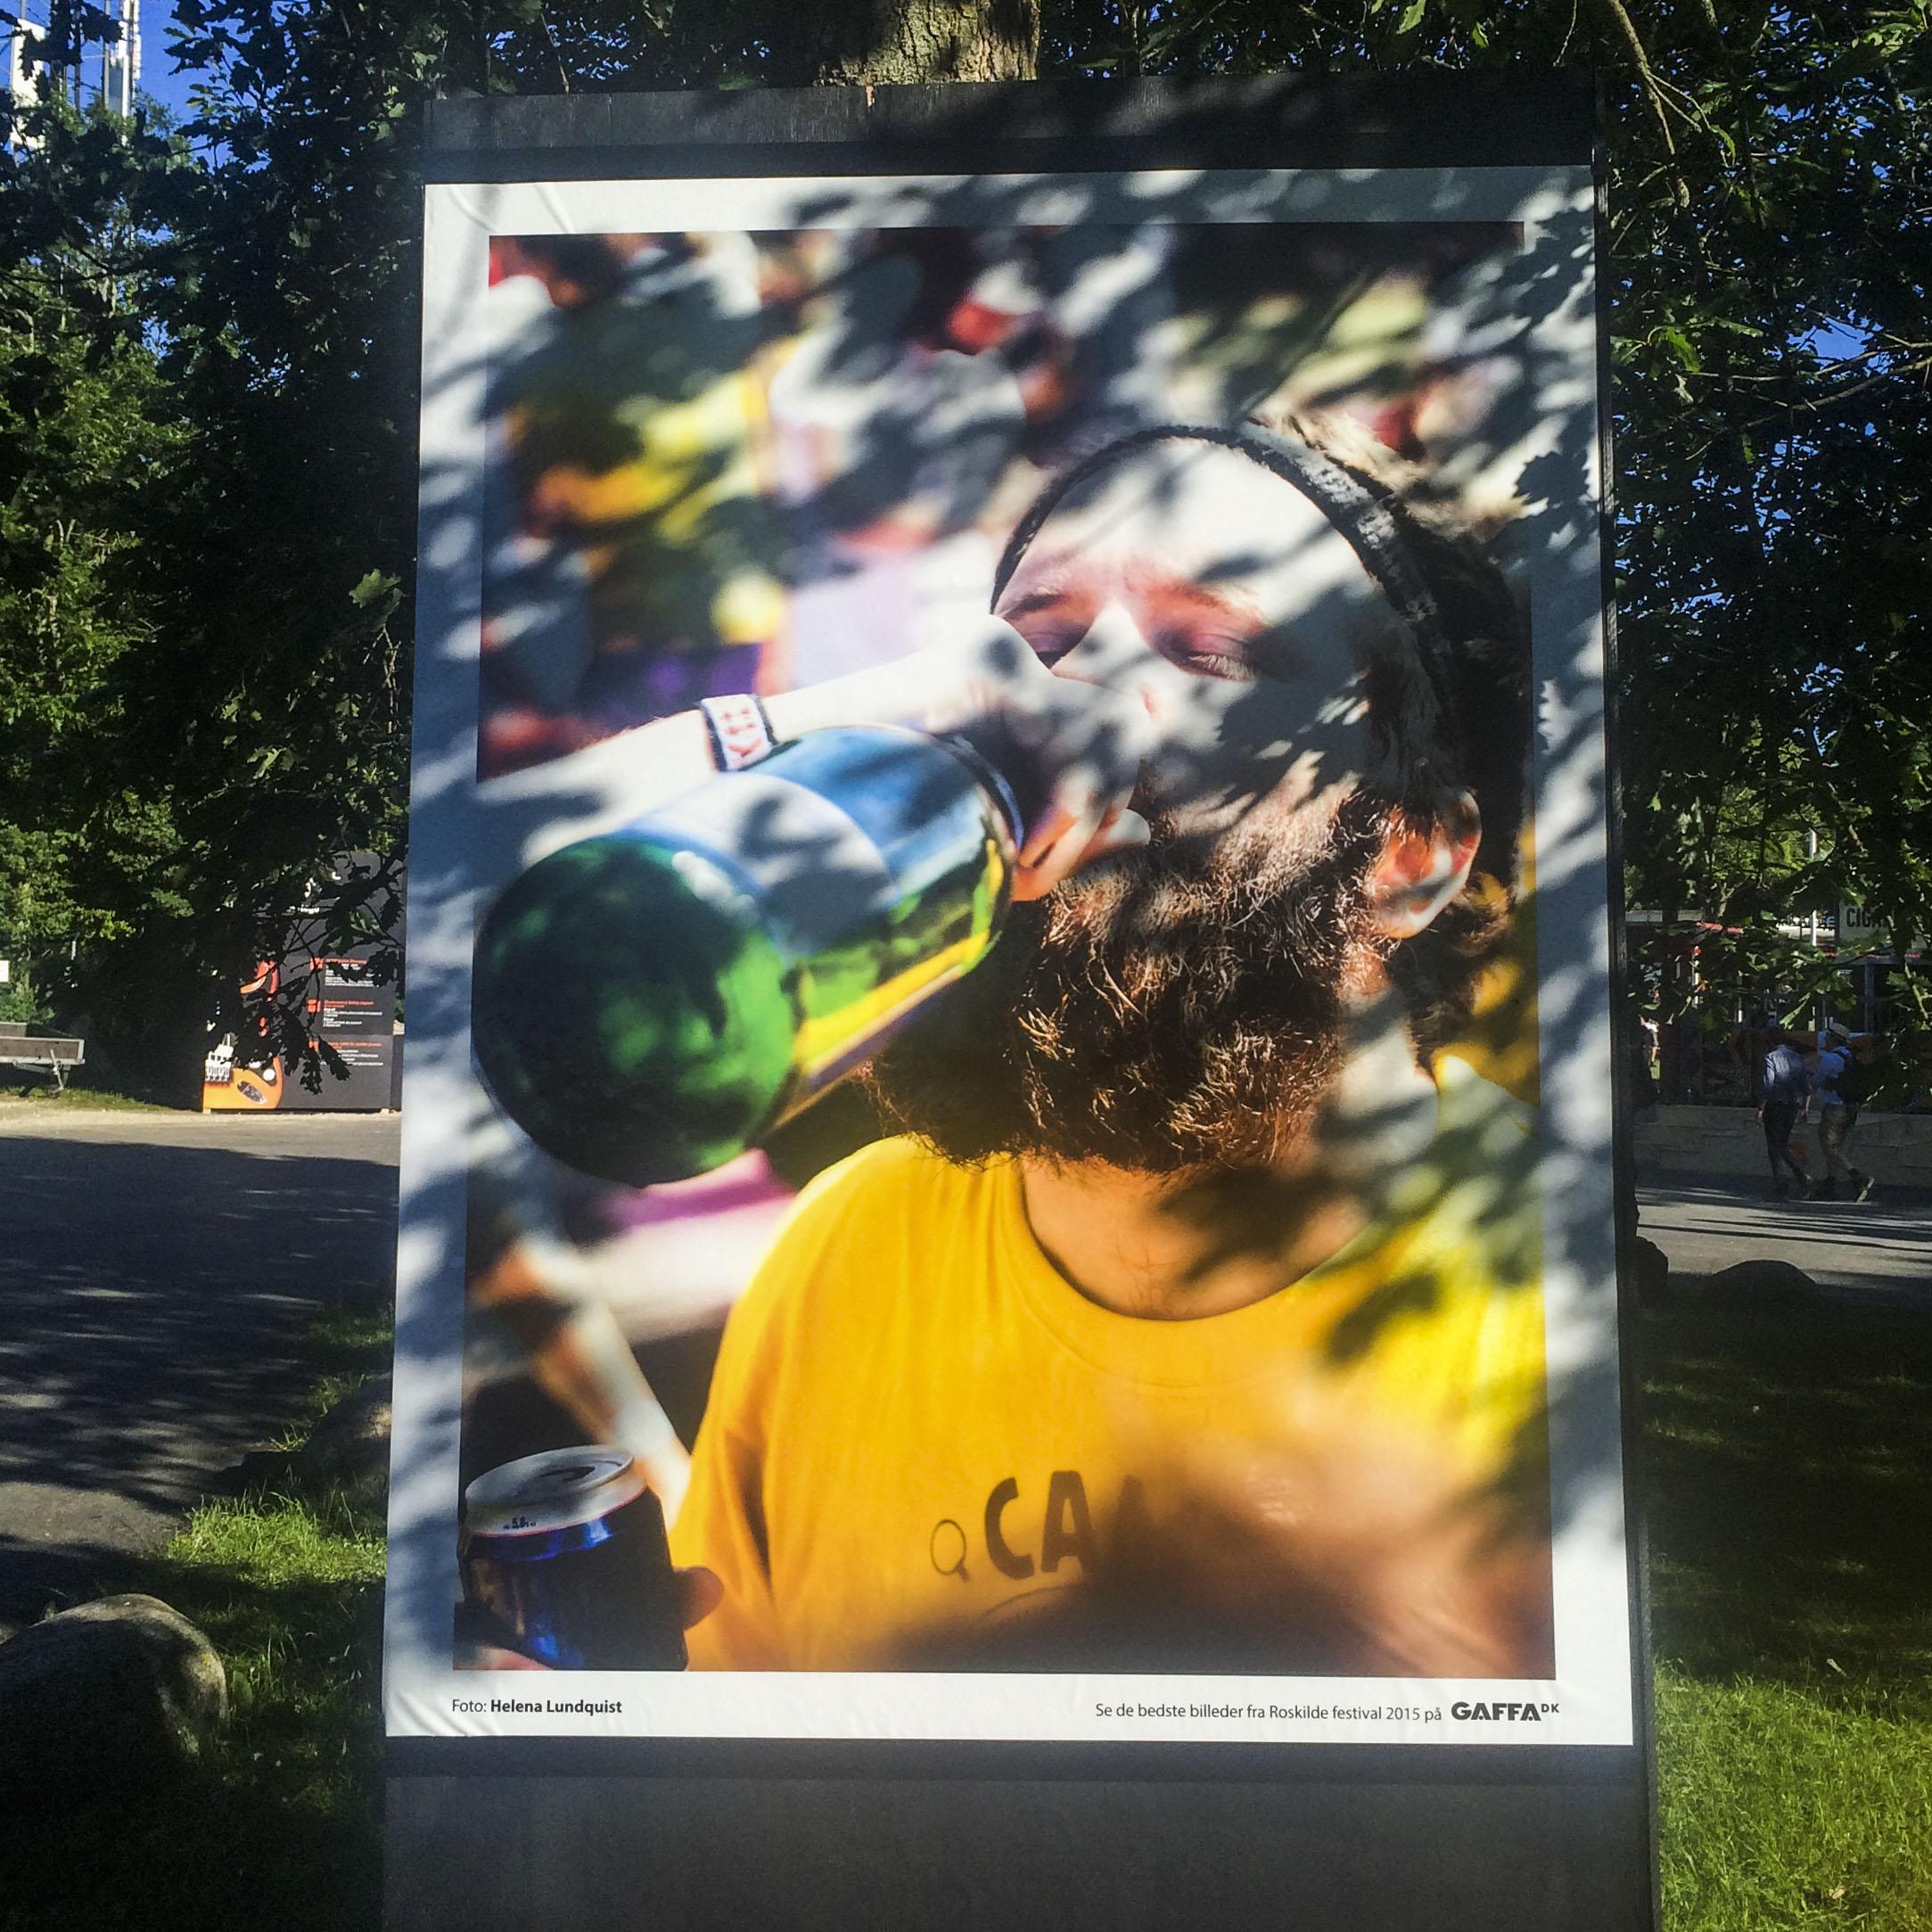 RF15_print_GAFFAdk_HelenaLundquist_mindre1